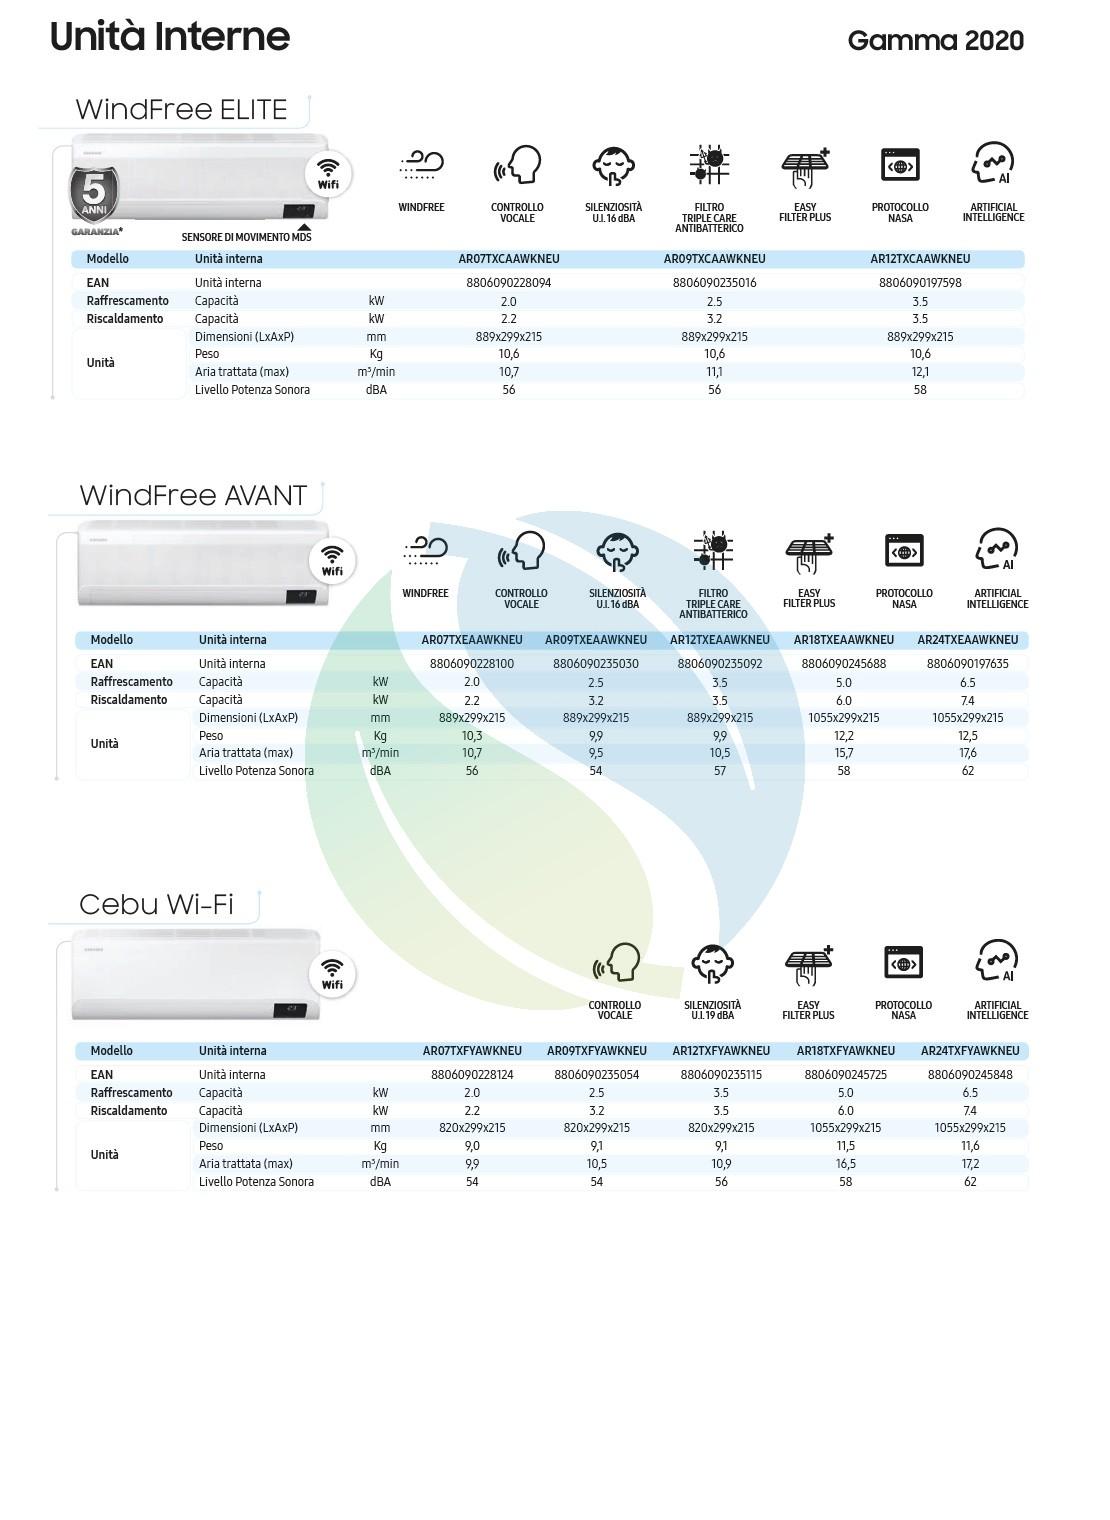 Samsung Quadri Split Serie Cebu Wi-Fi AJ080TXJ4KG/EU 7+7+7+7 Btu